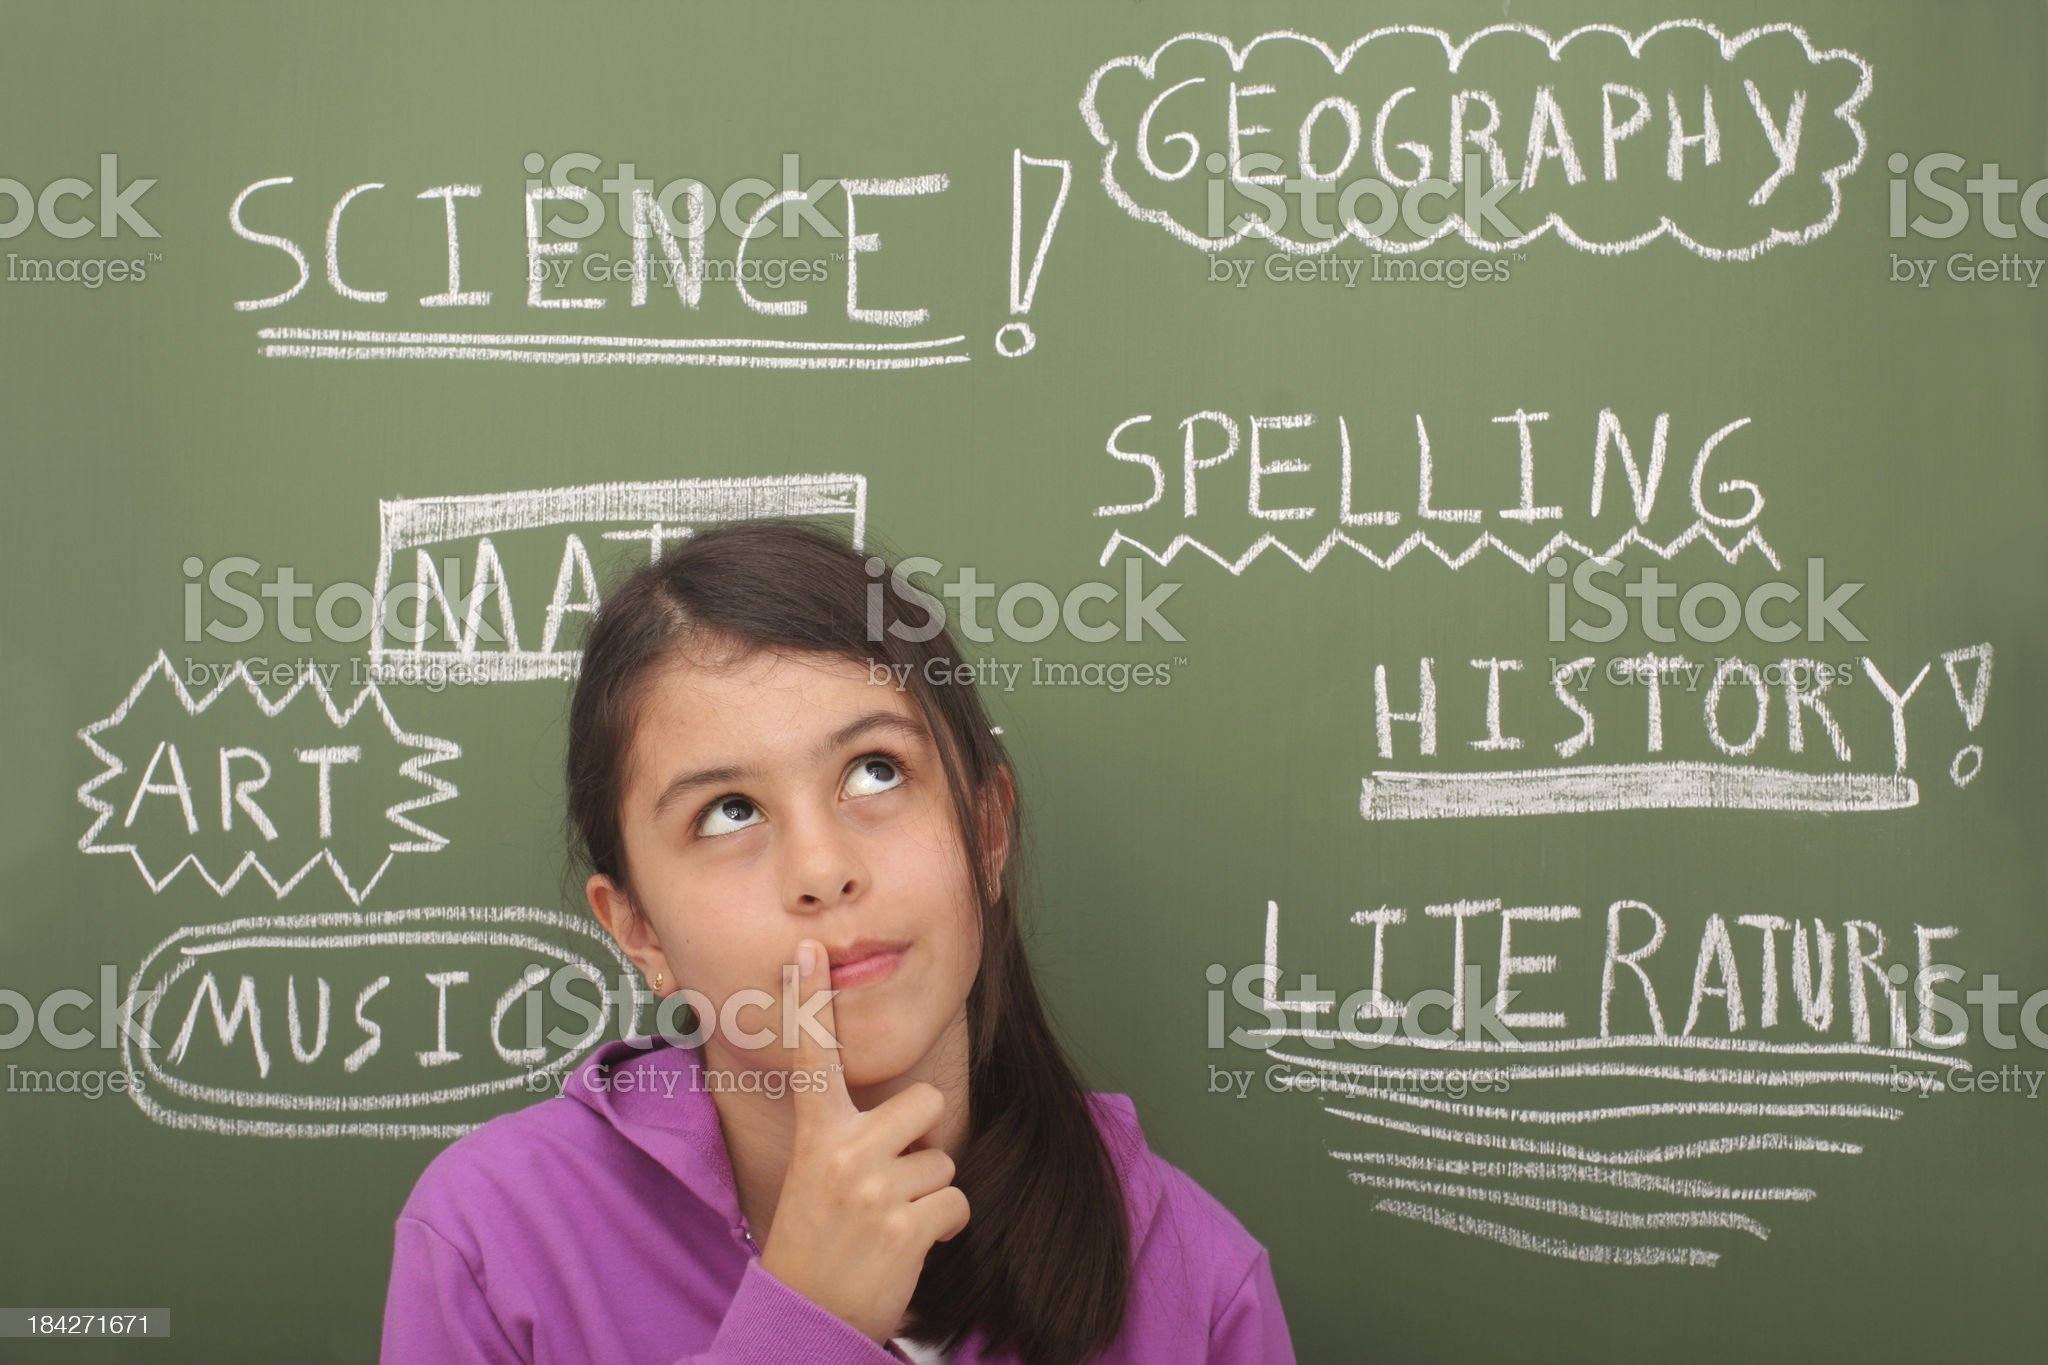 School Subjects royalty-free stock photo